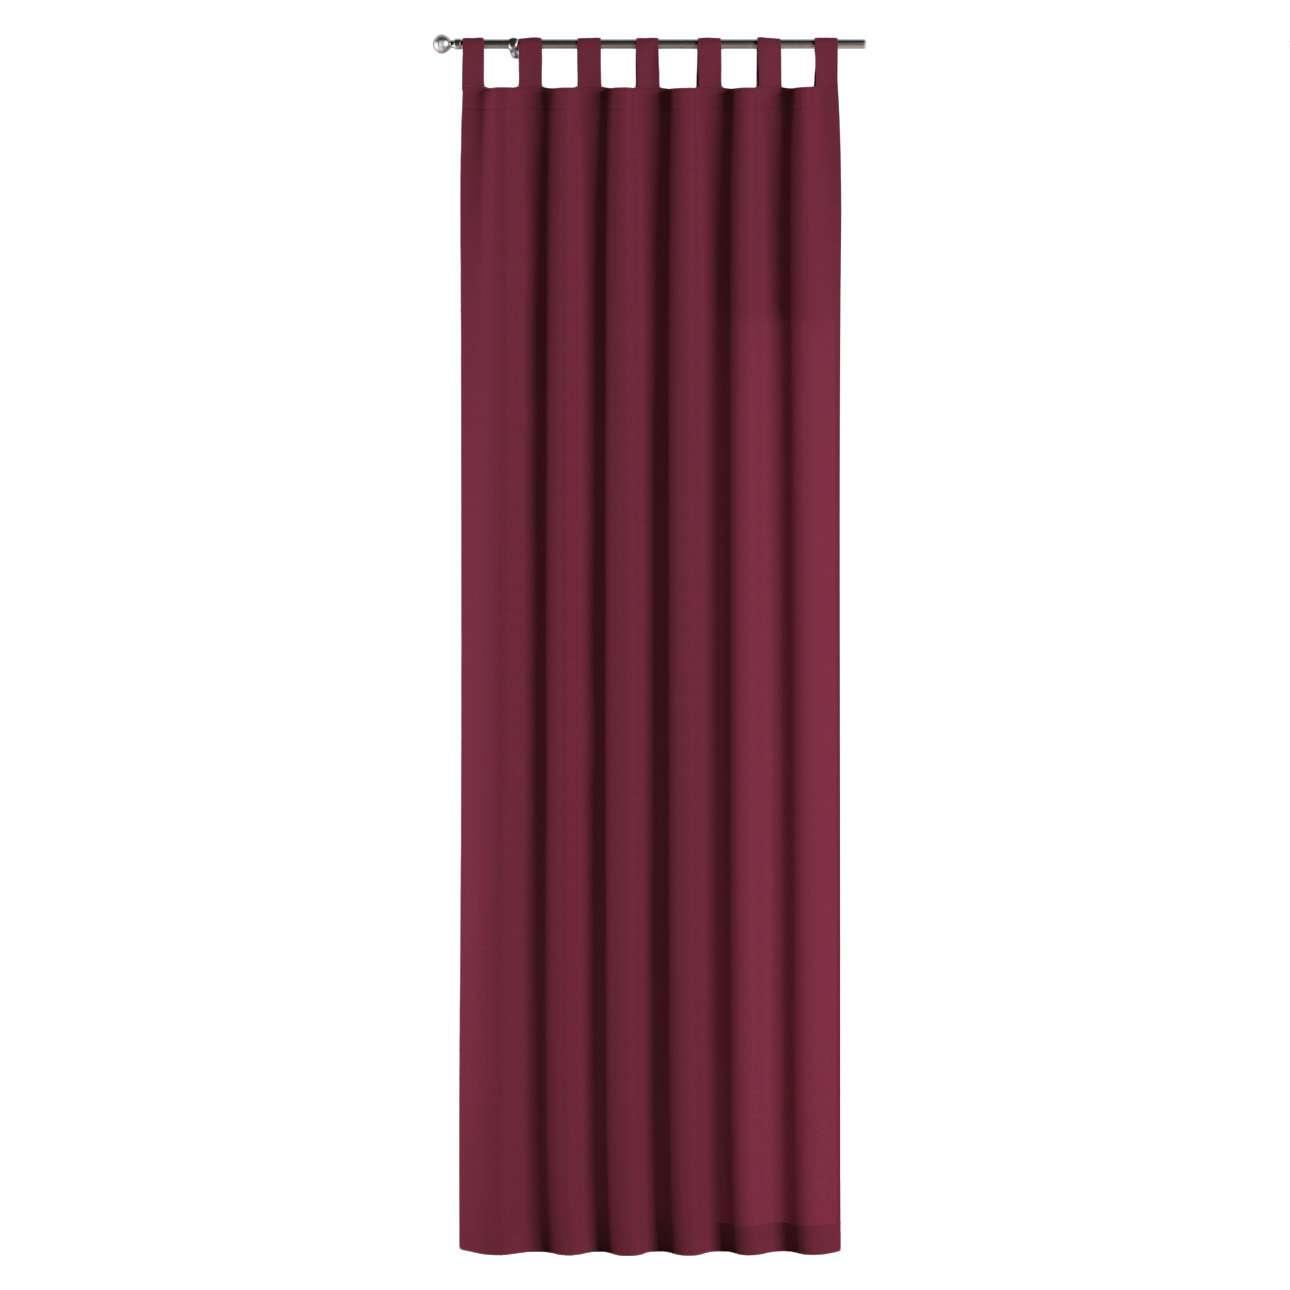 Gardin med stropper 1 stk. fra kollektionen Cotton Panama, Stof: 702-32